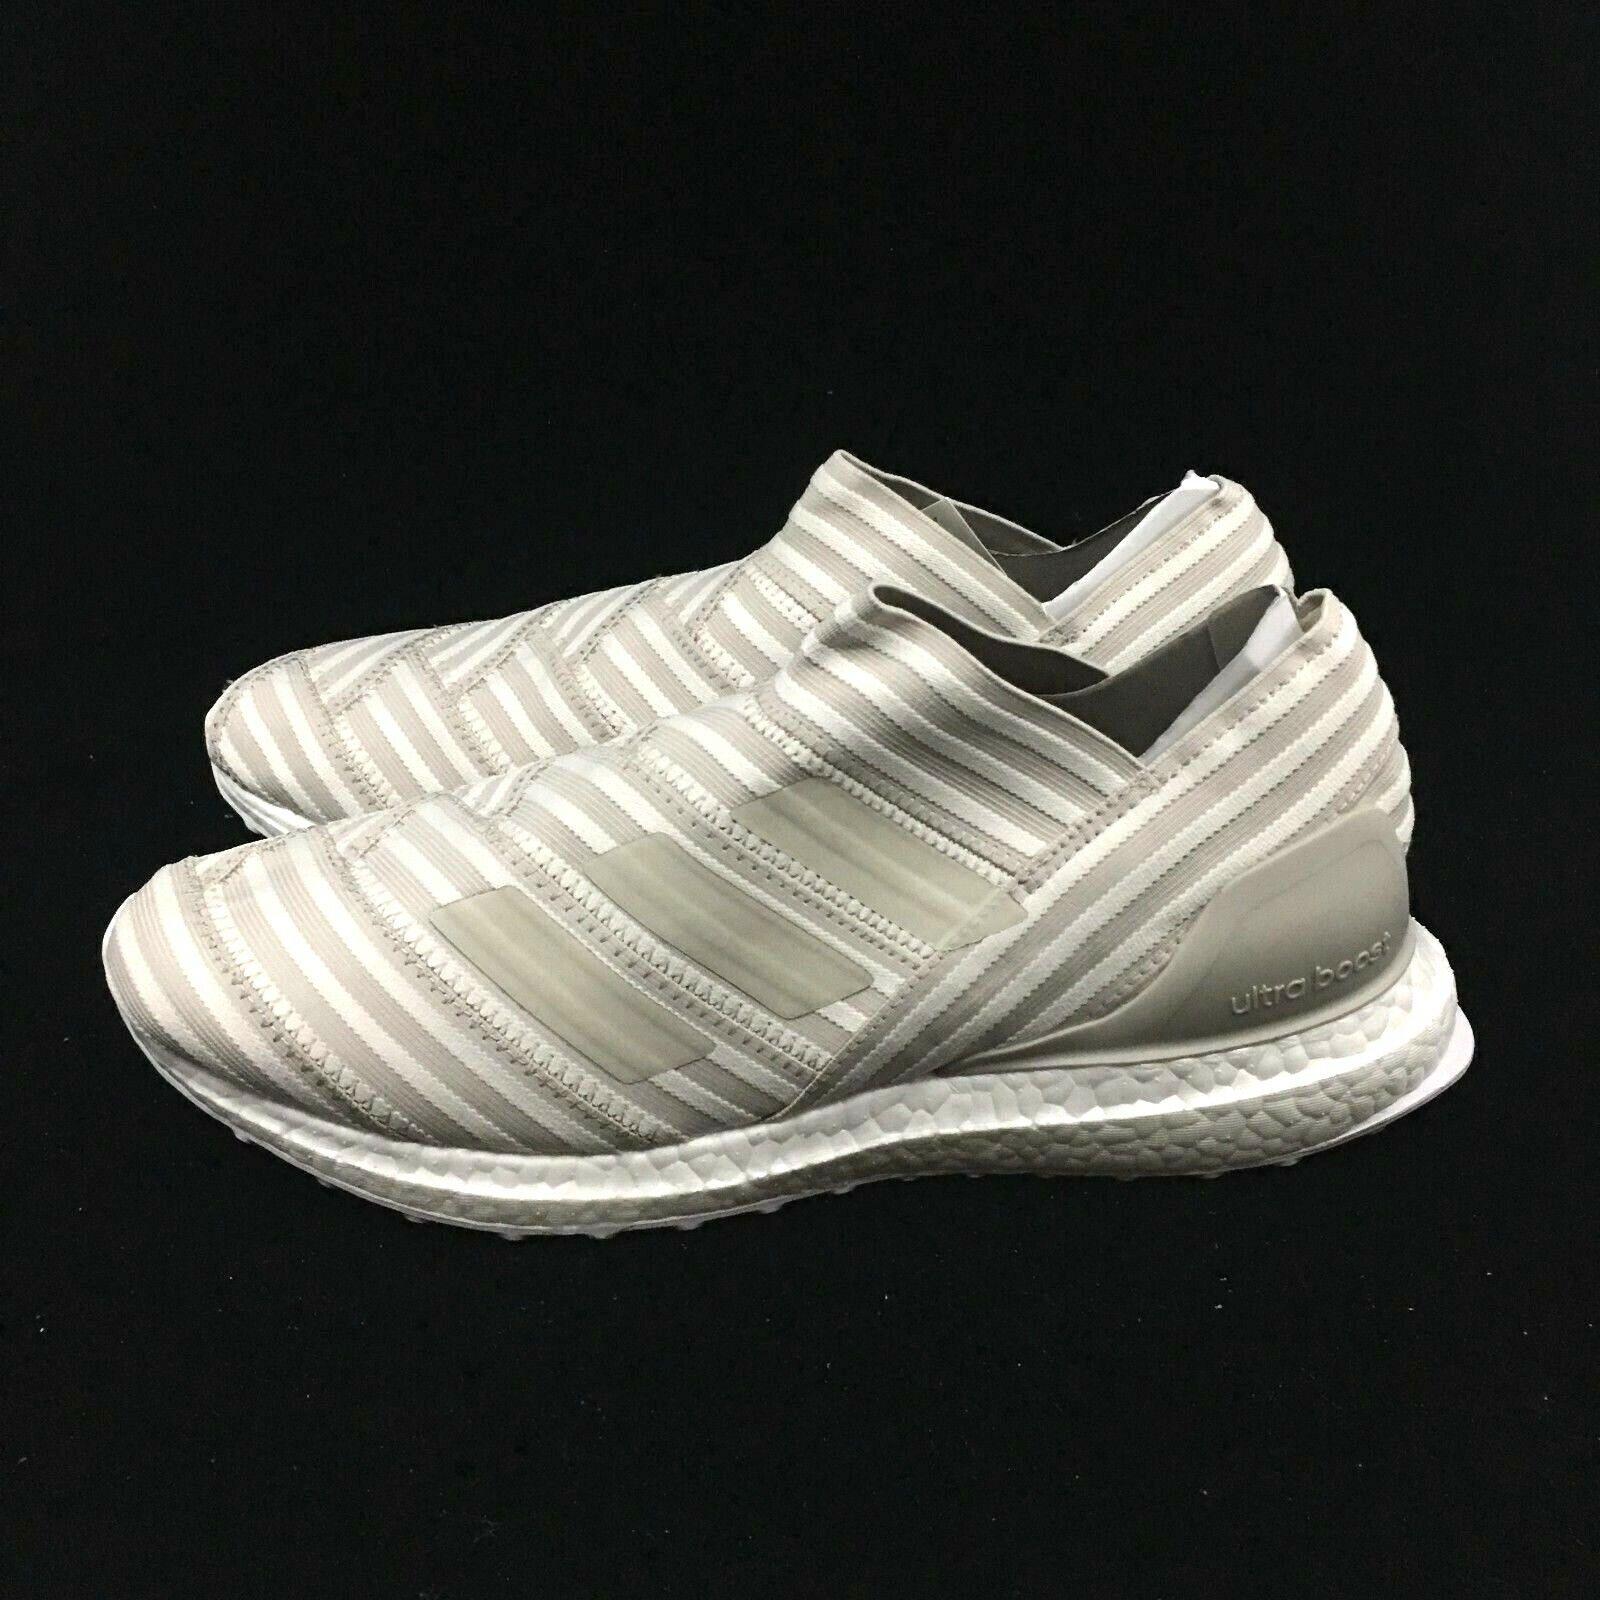 Adidas Men's Nemeziz Tango 17 + 360 Agility Ultra Boost Men CG3660